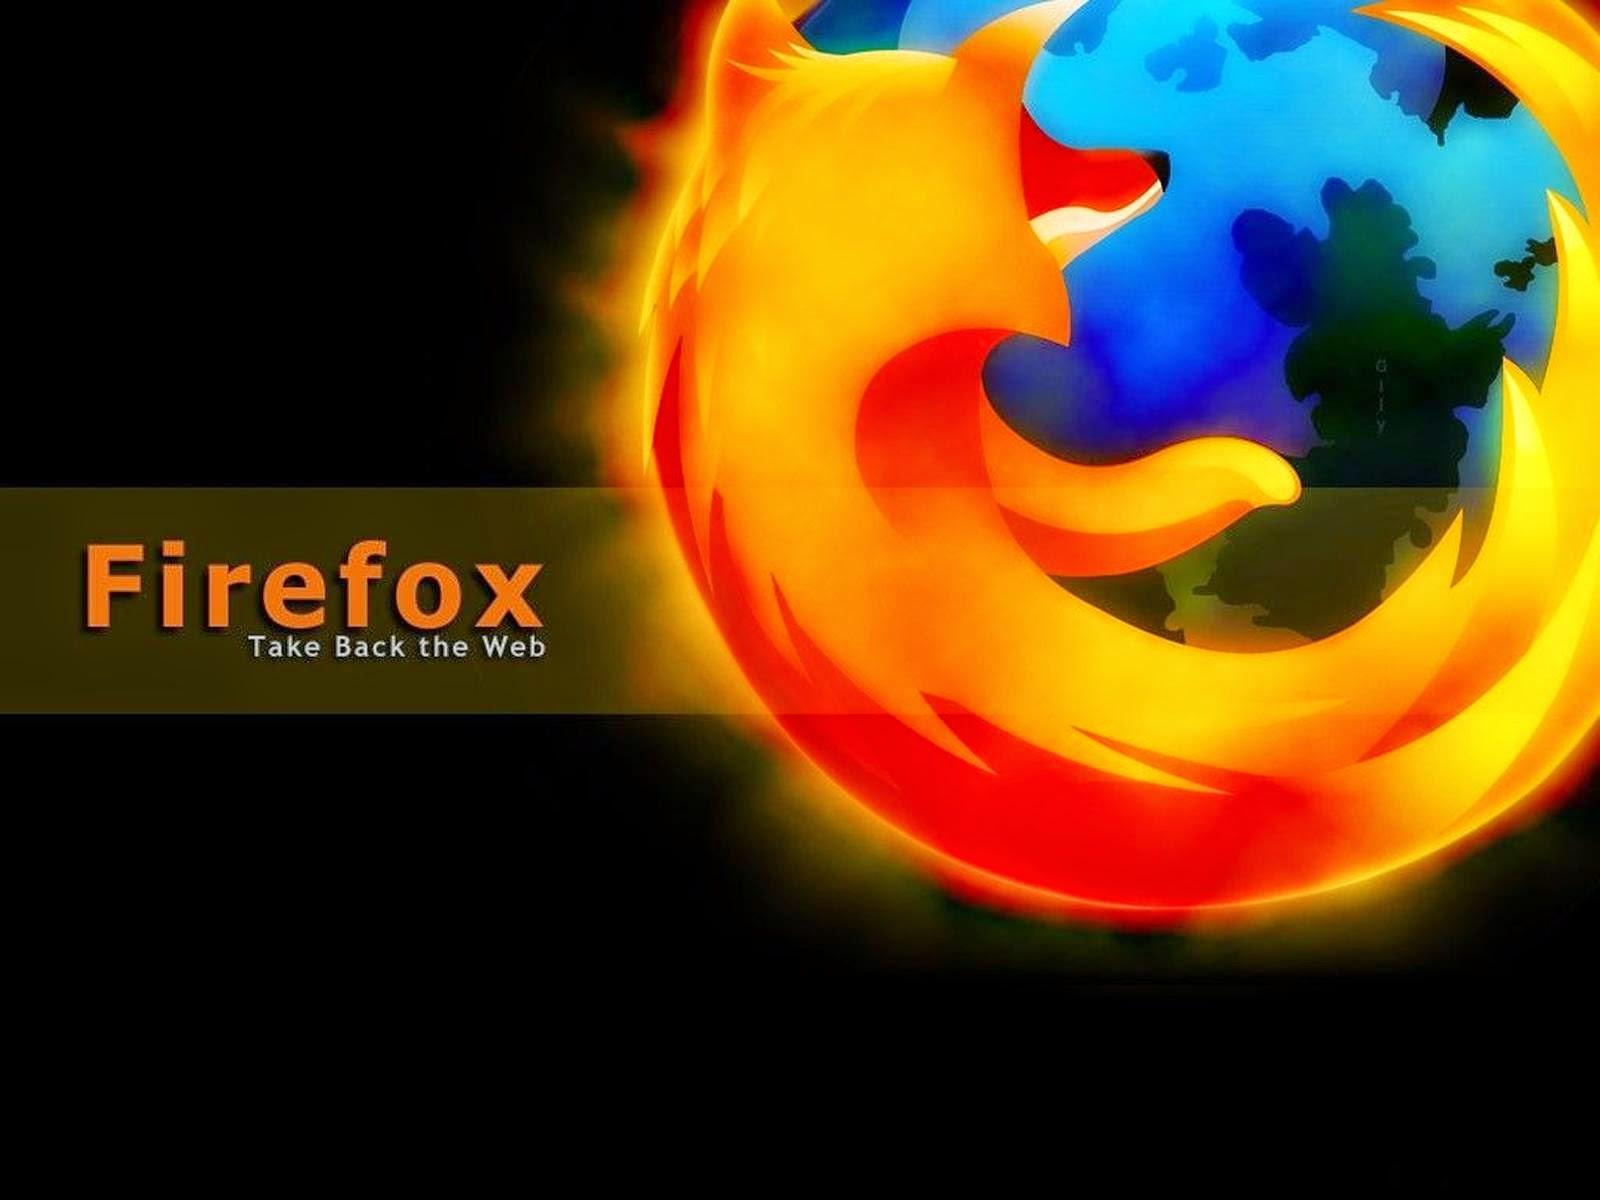 Mozilla Firefox 33.0.2